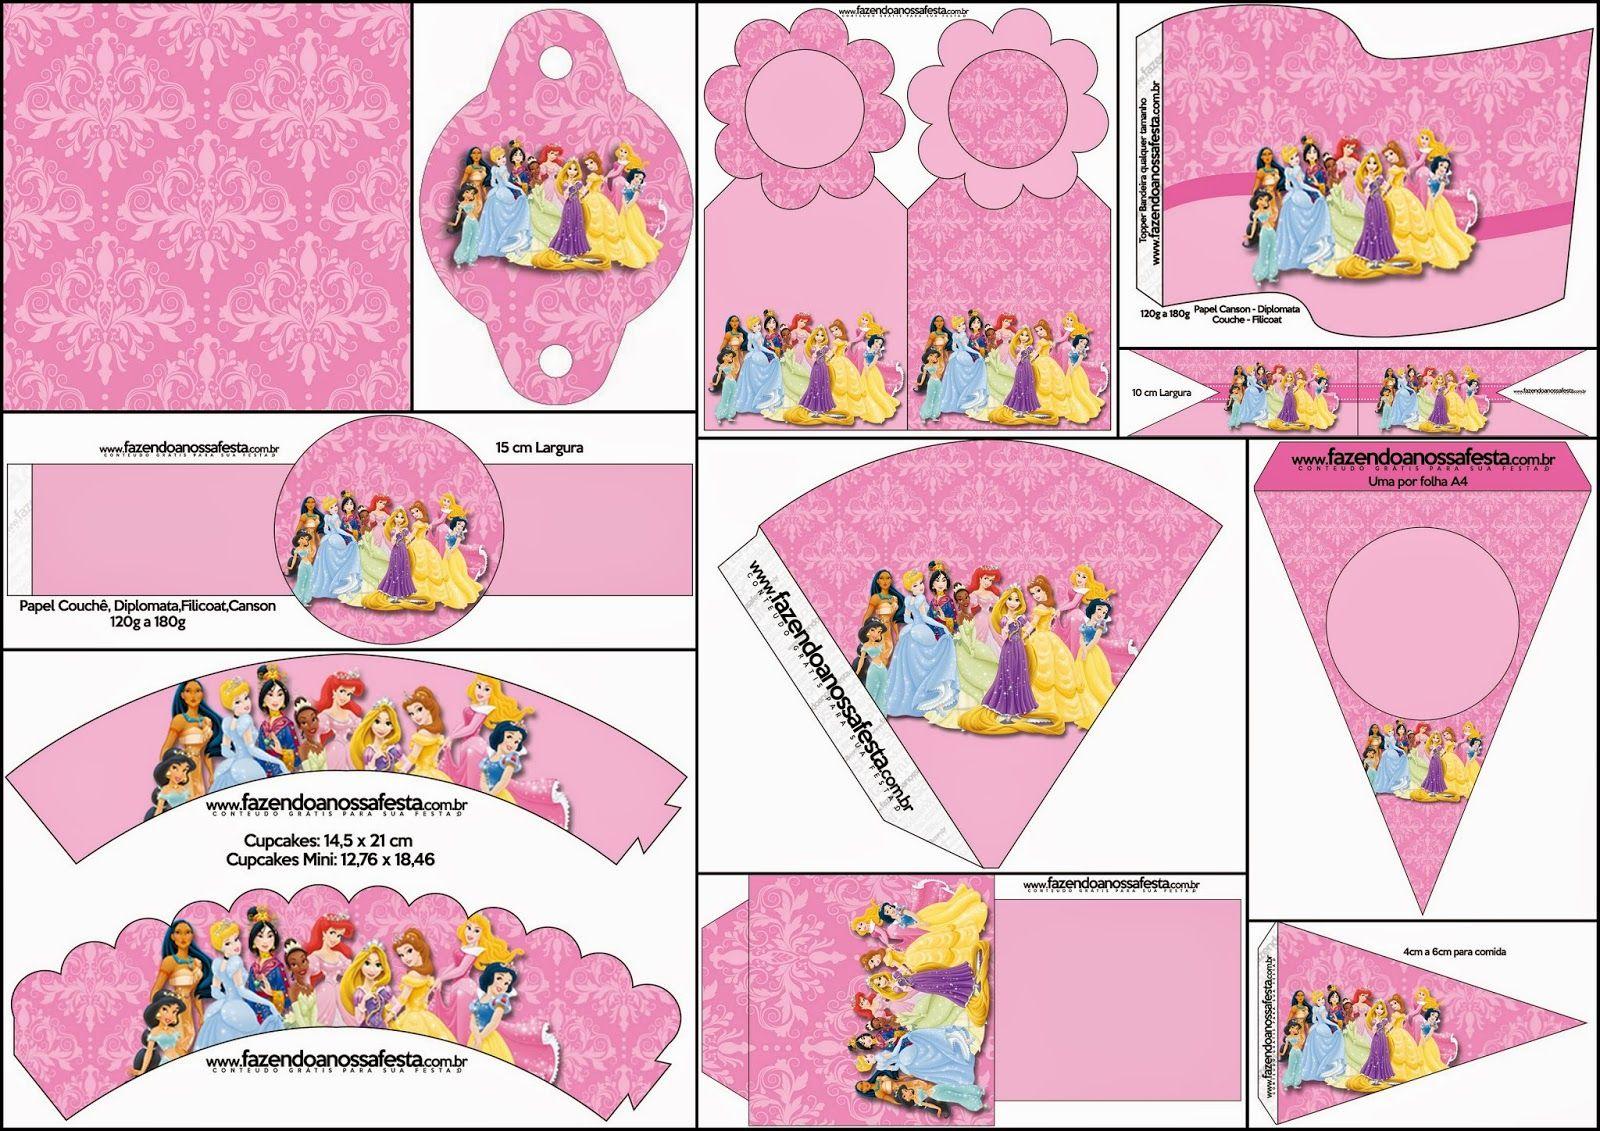 Disney Princess Party Free Party Printables